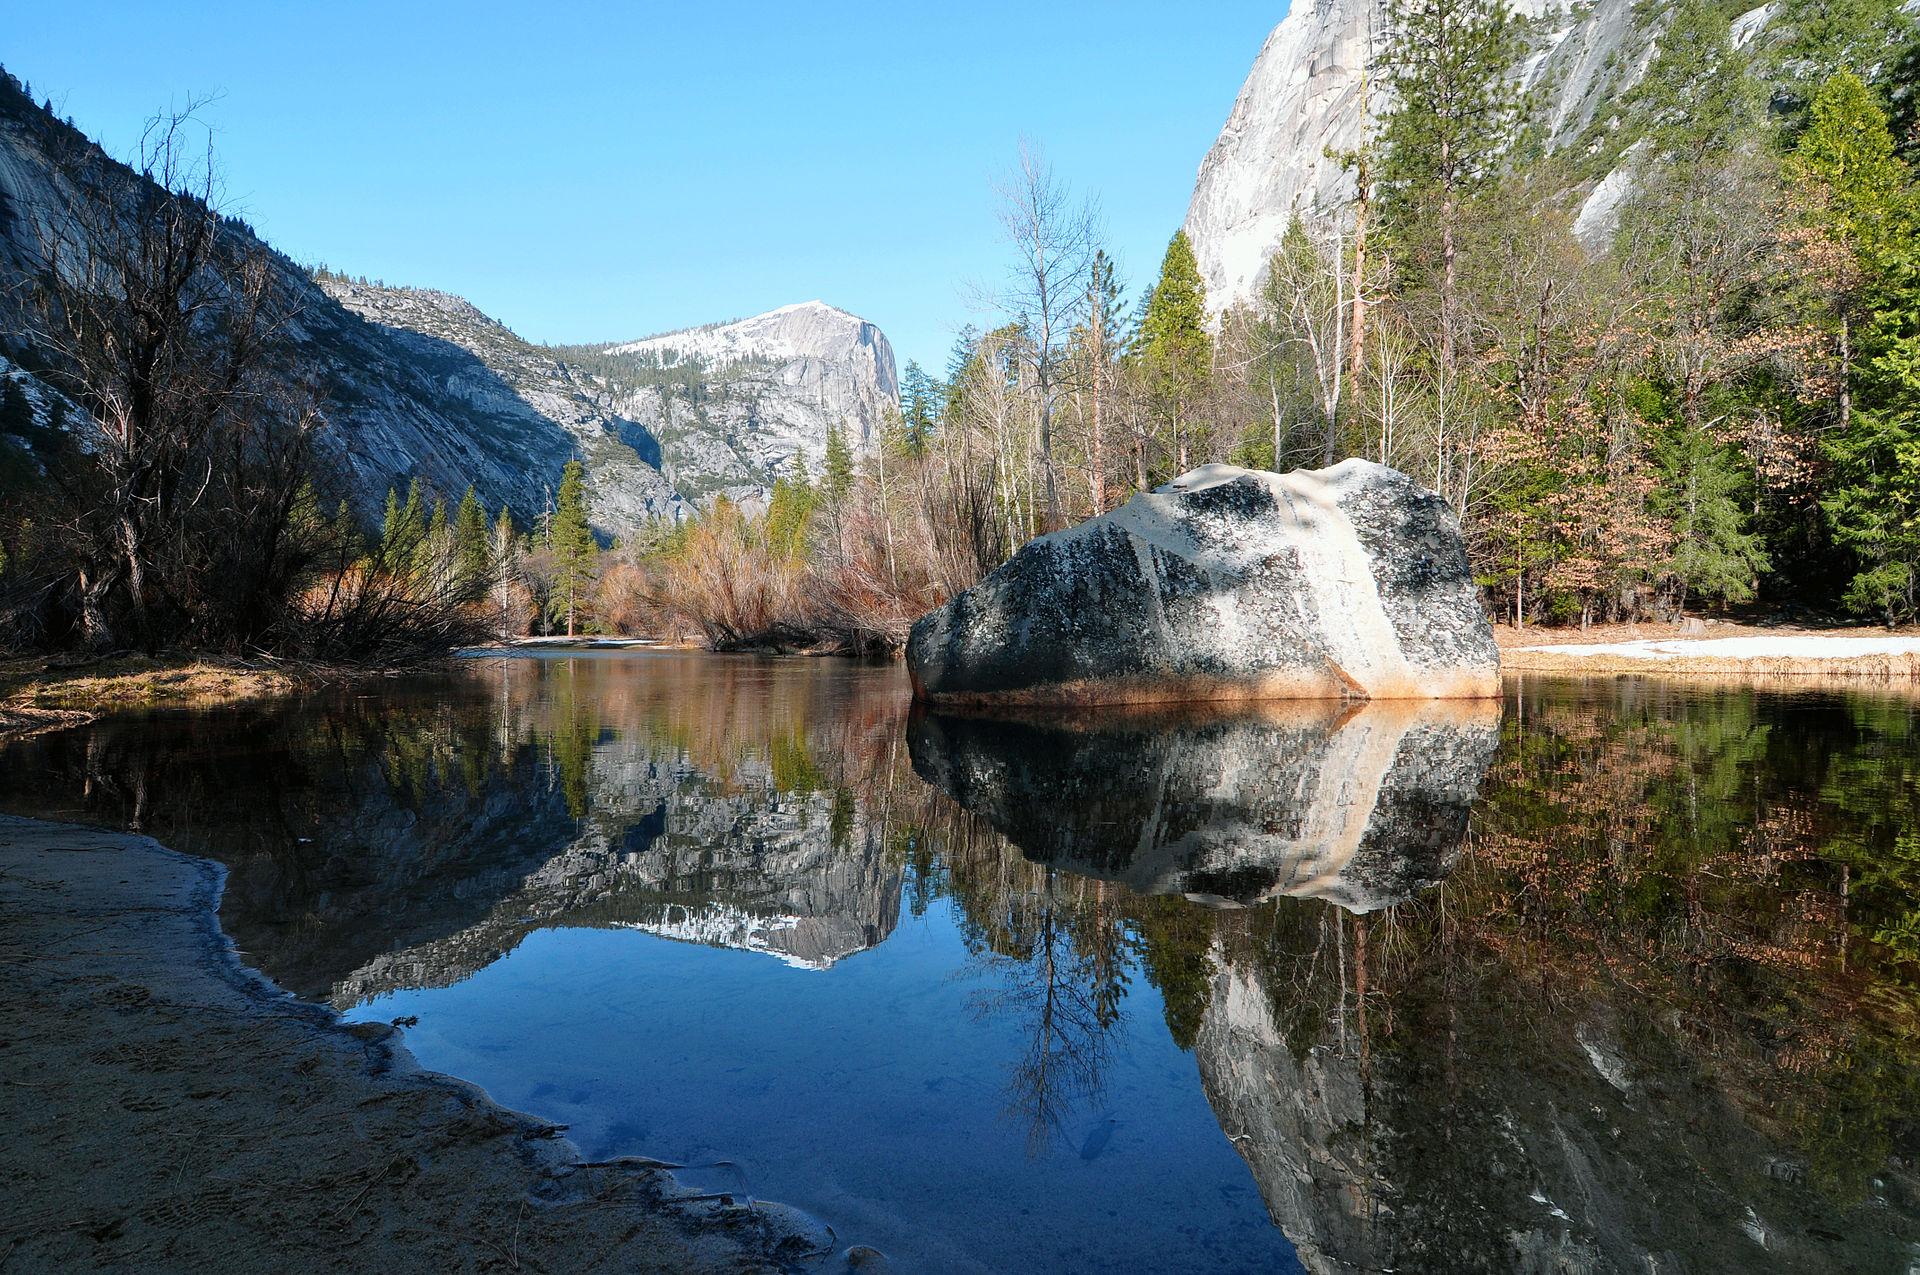 Yosemite national park mirror lake 2010u.JPG